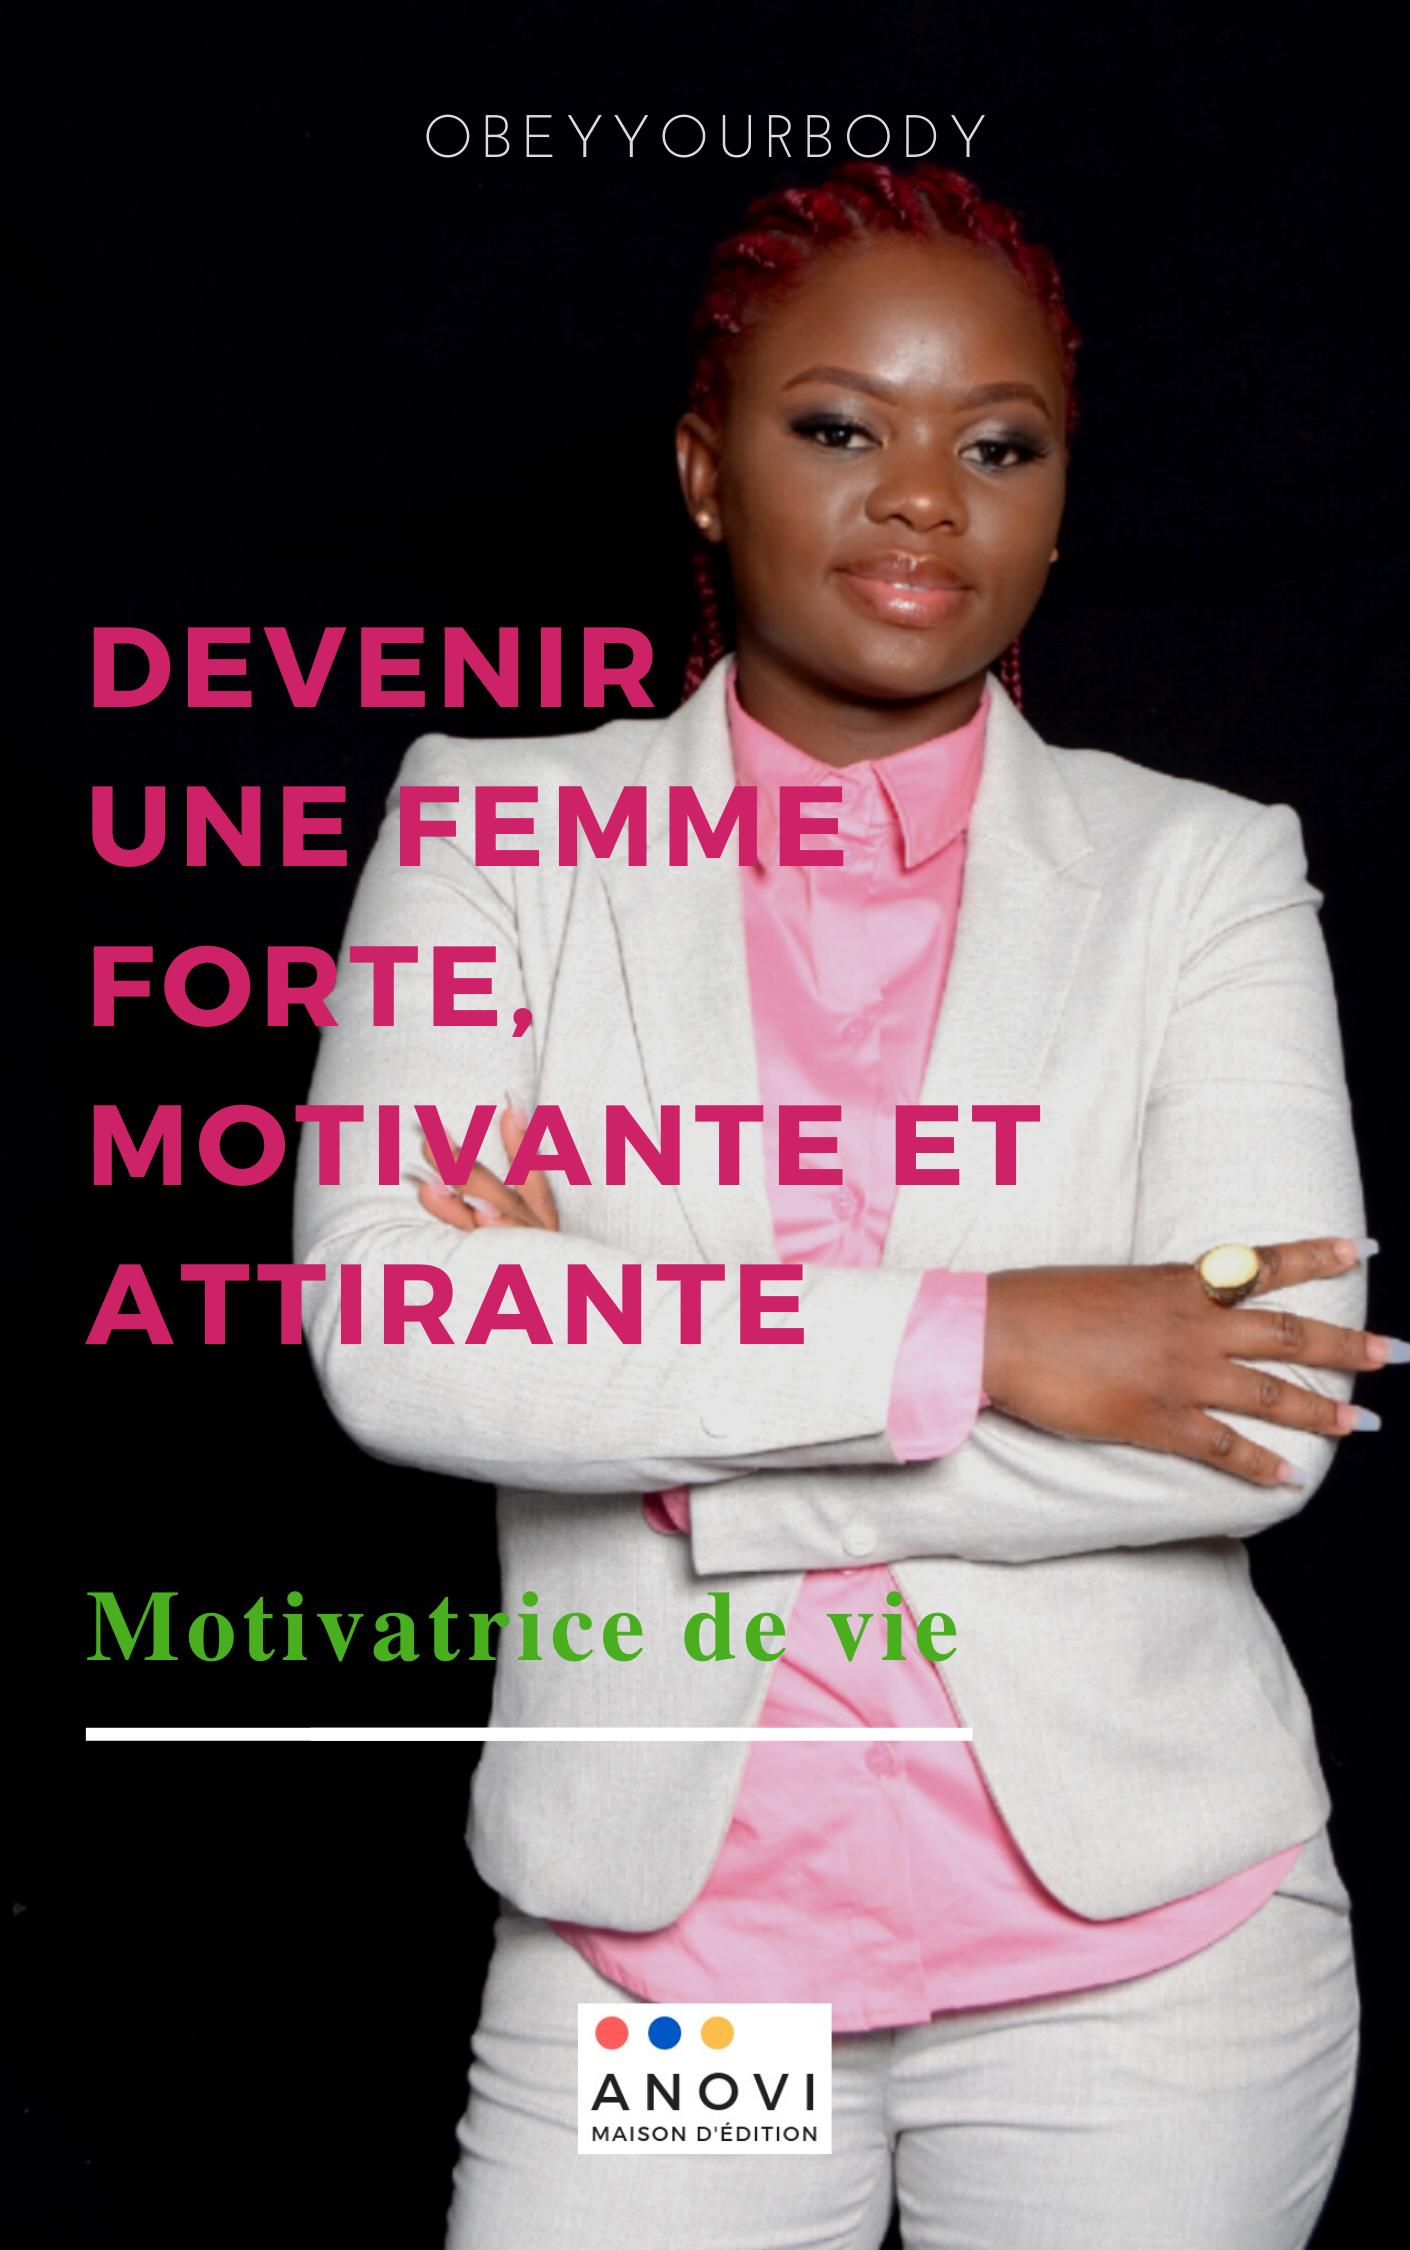 Devenir une femme forte, motivante et attirante Image